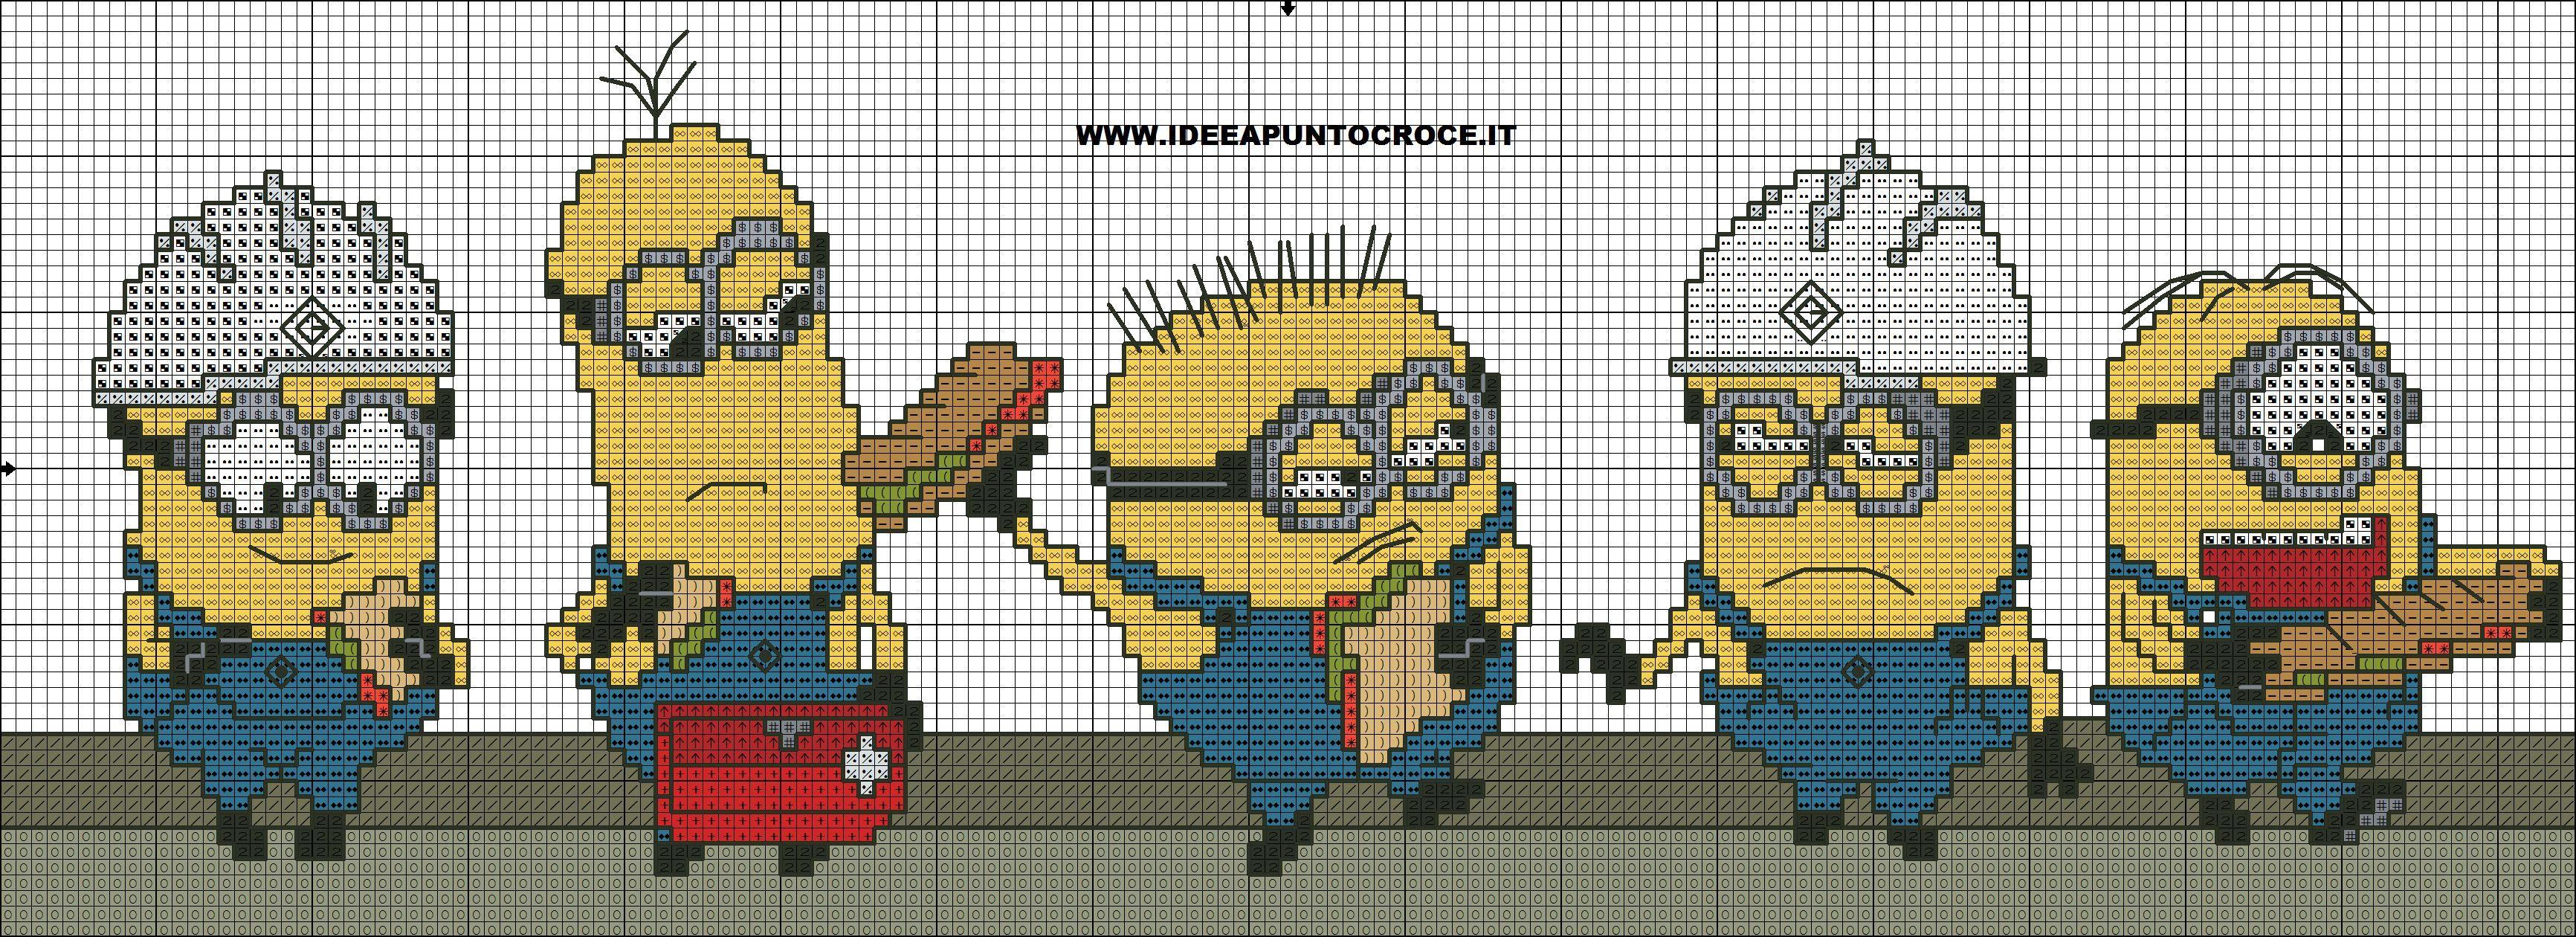 minions_cross_stitch_pattern_by_syra1974-d9drda4.jpg (3465×1260)